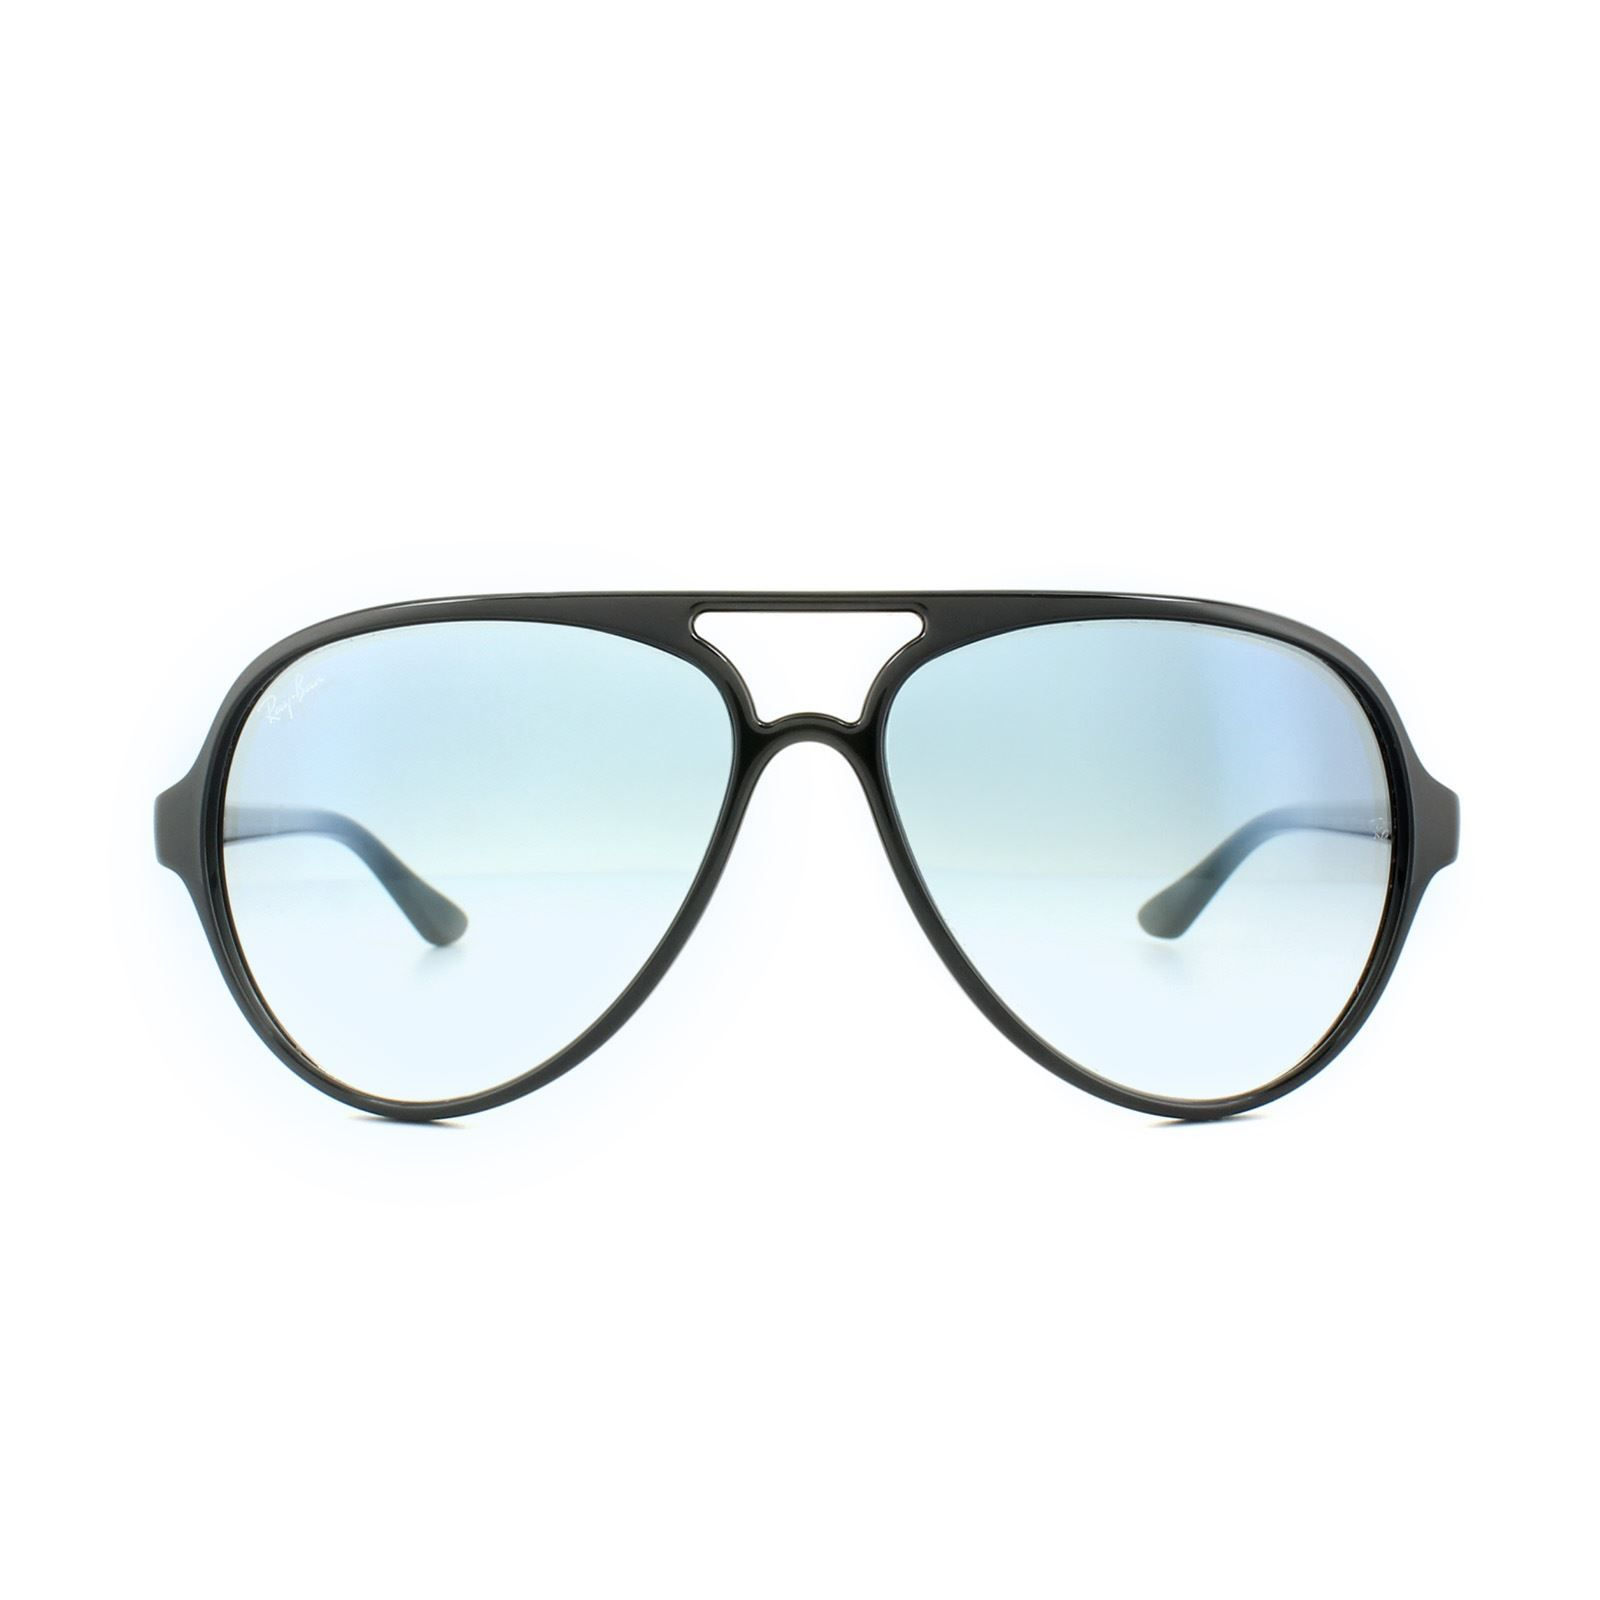 Ray-Ban Sunglasses Cats 5000 4125 601/3F Black Light Blue Gradient